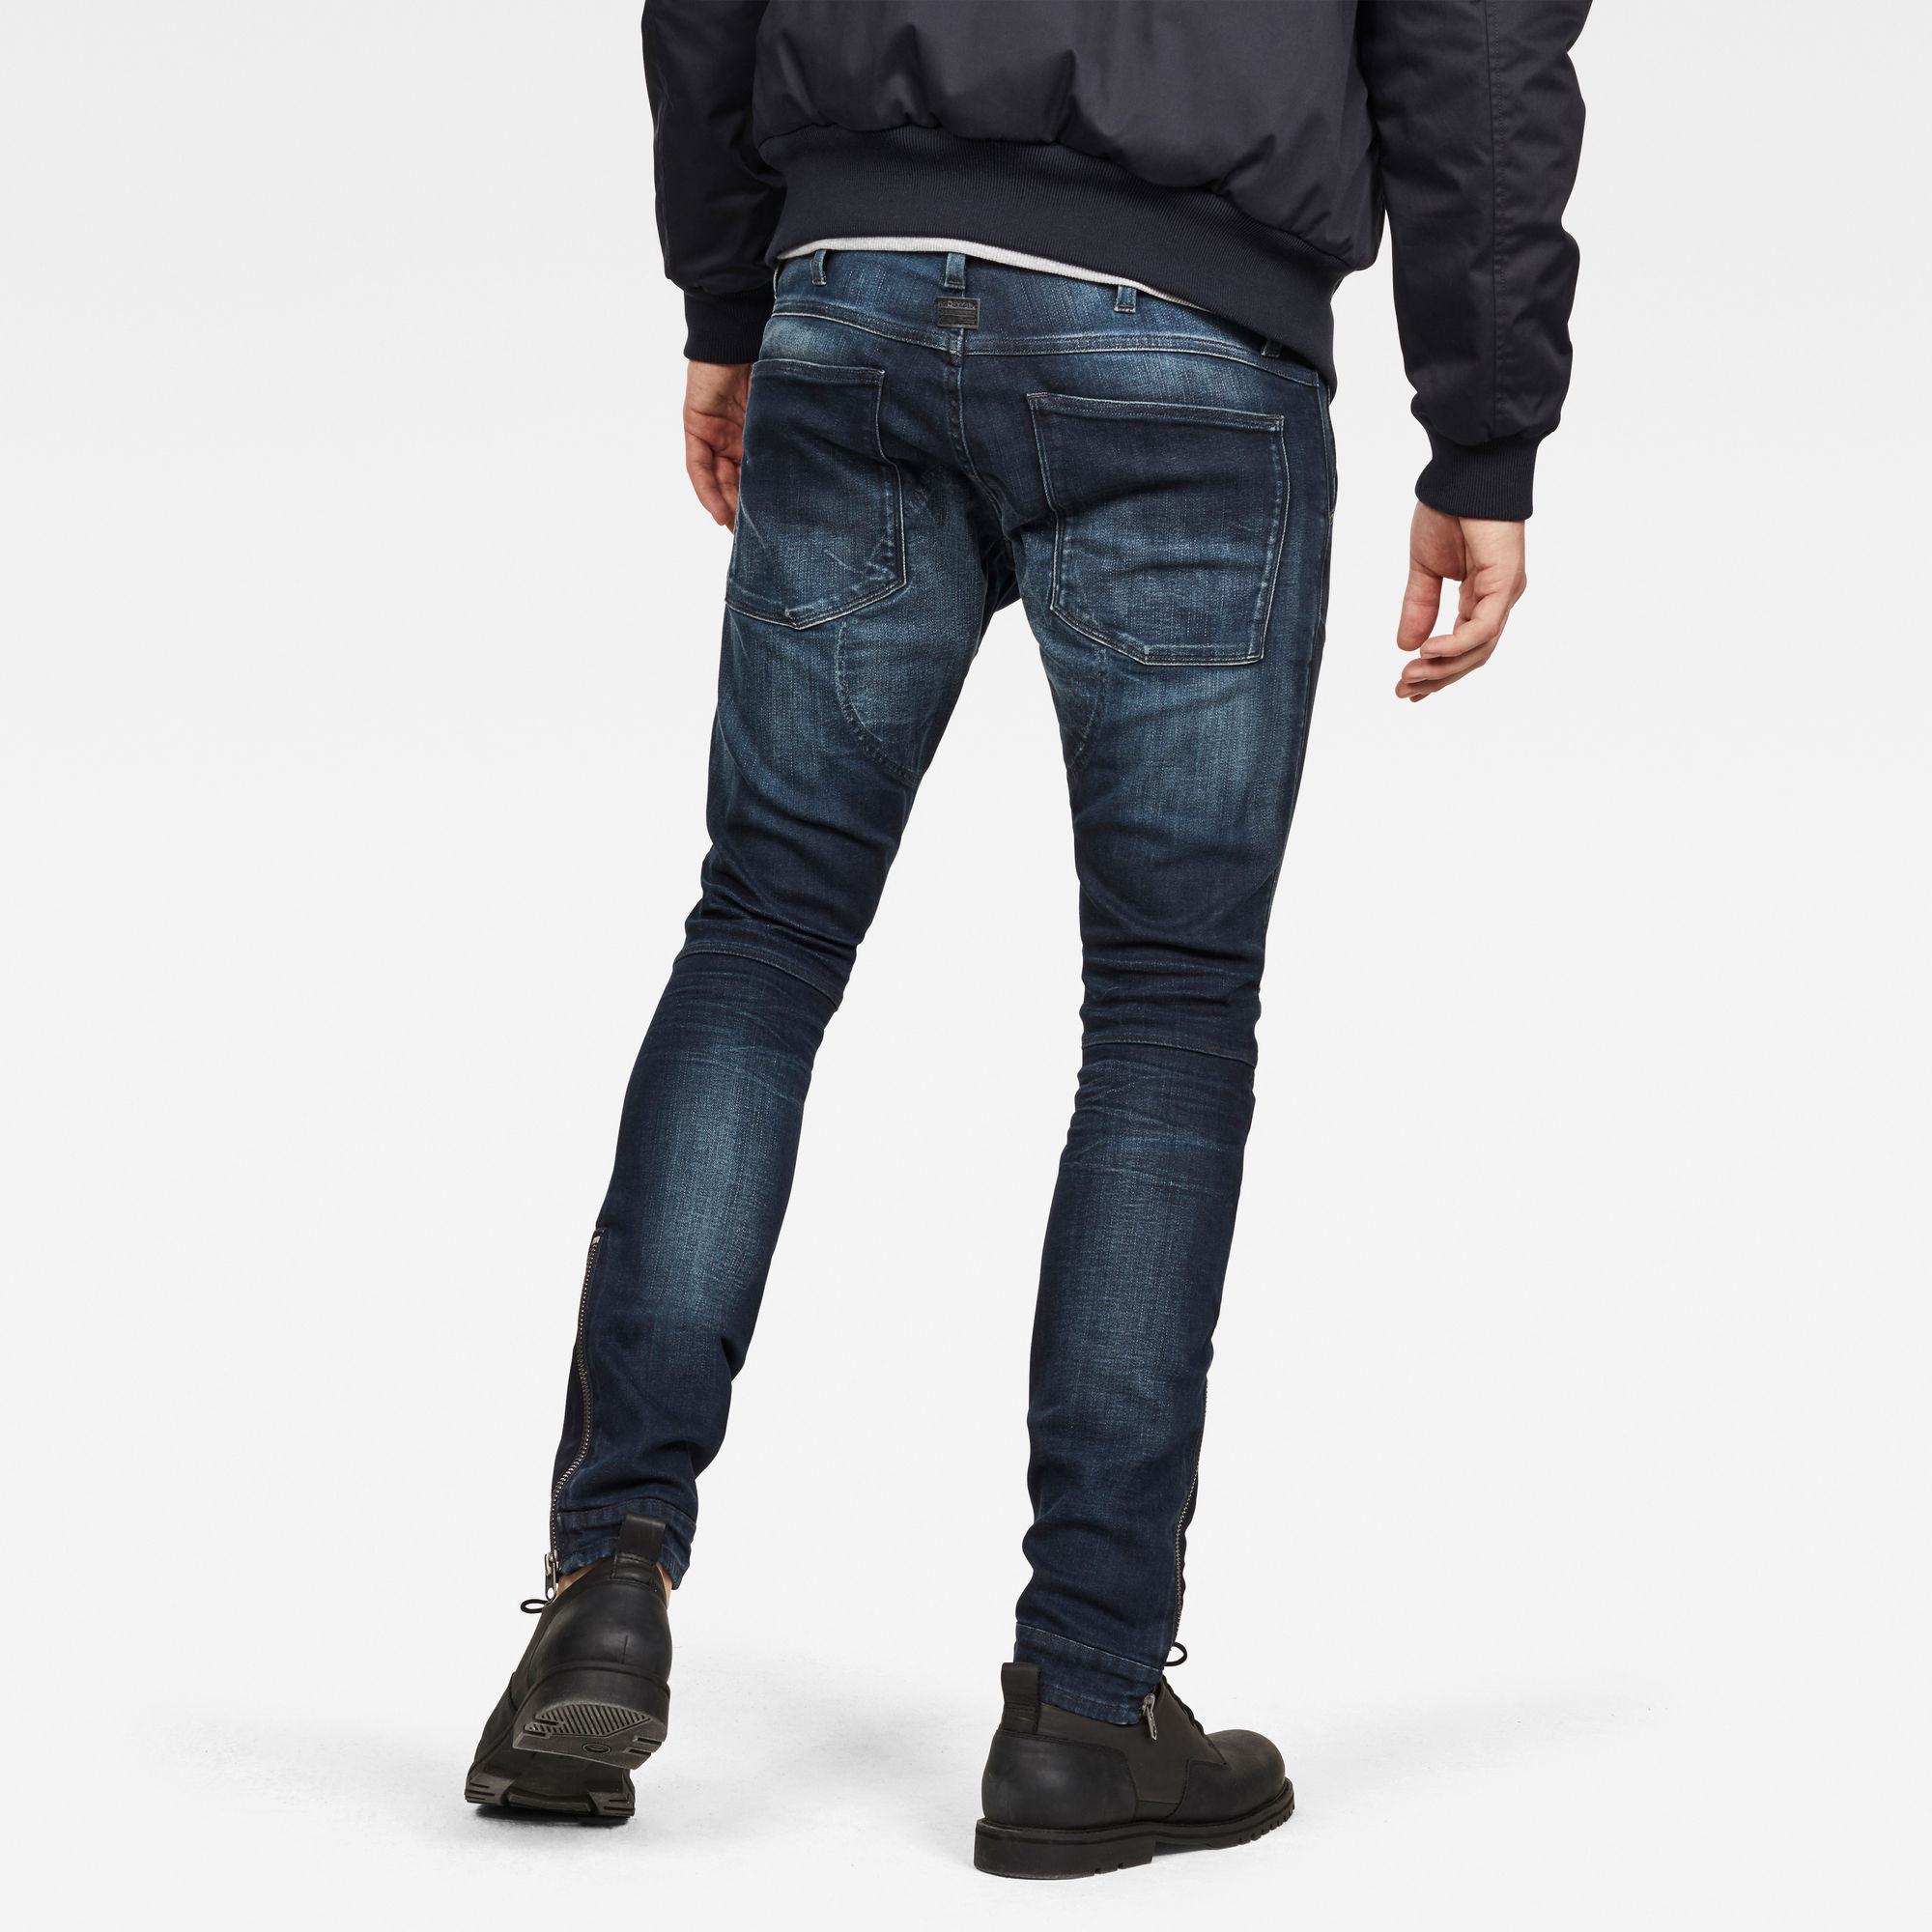 G-Star RAW 5620 G-Star Elwood 3D Ankle Zip Skinny Jeans